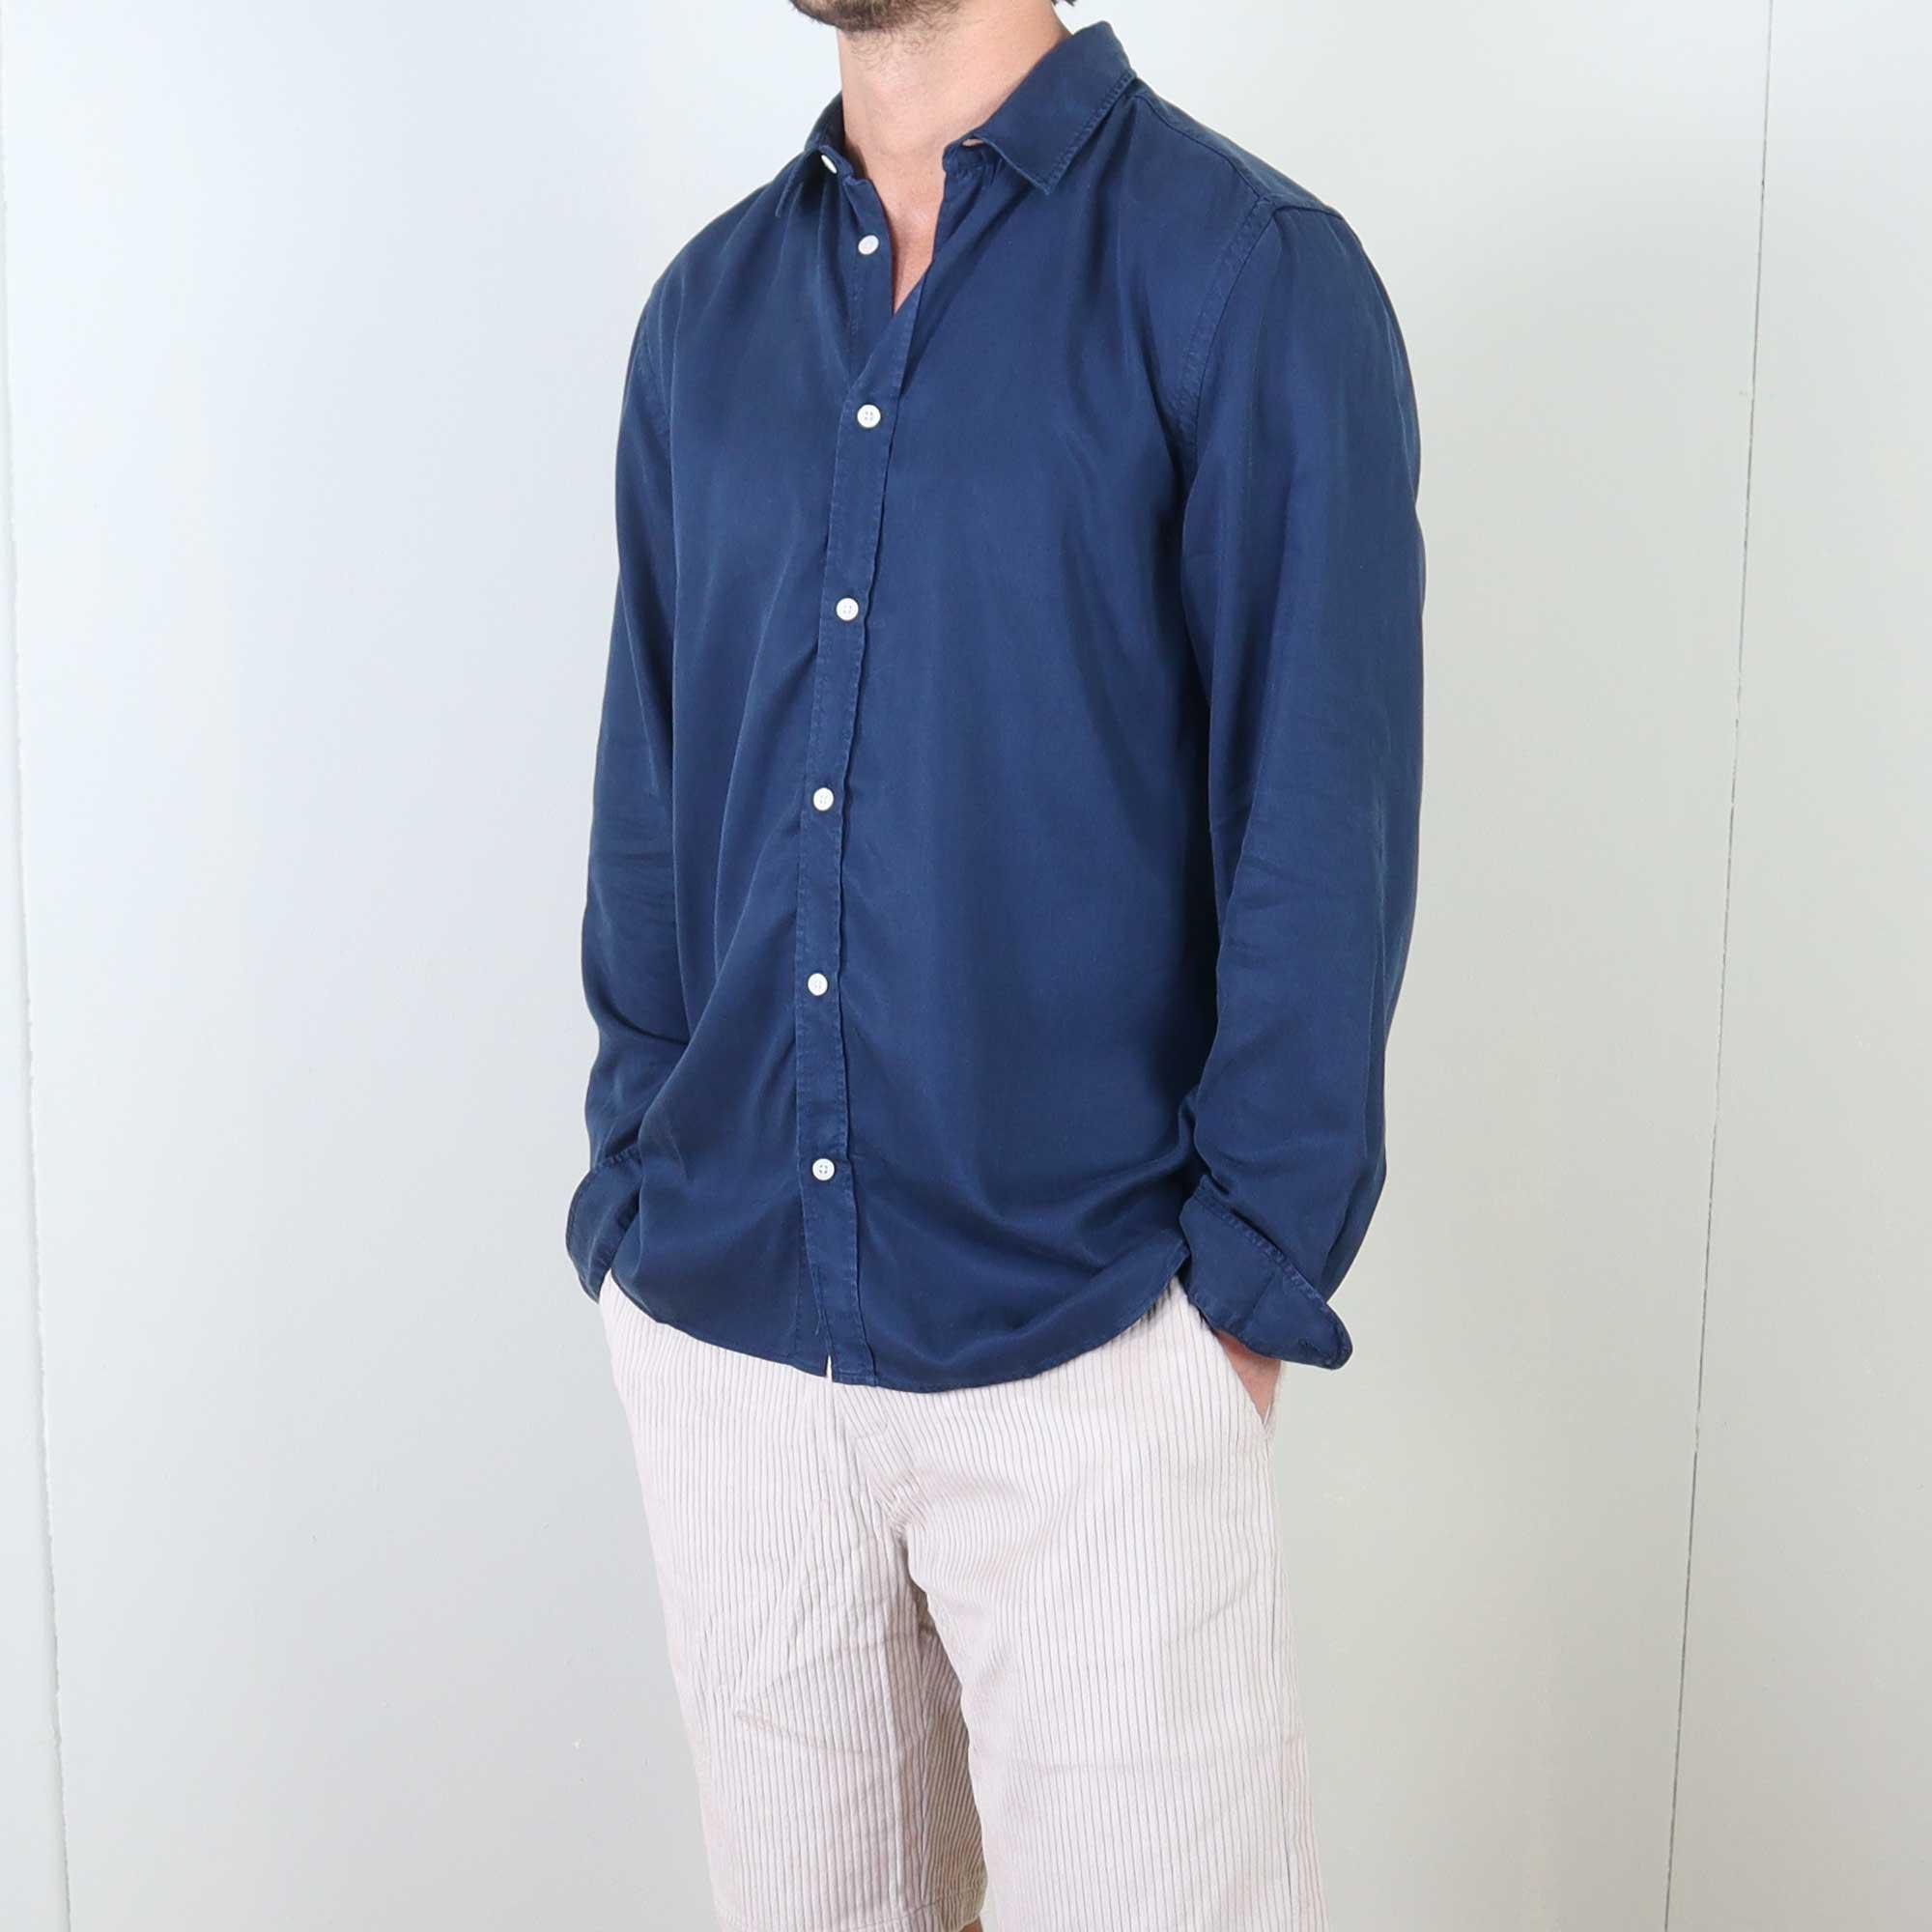 blouse-darkblue-5